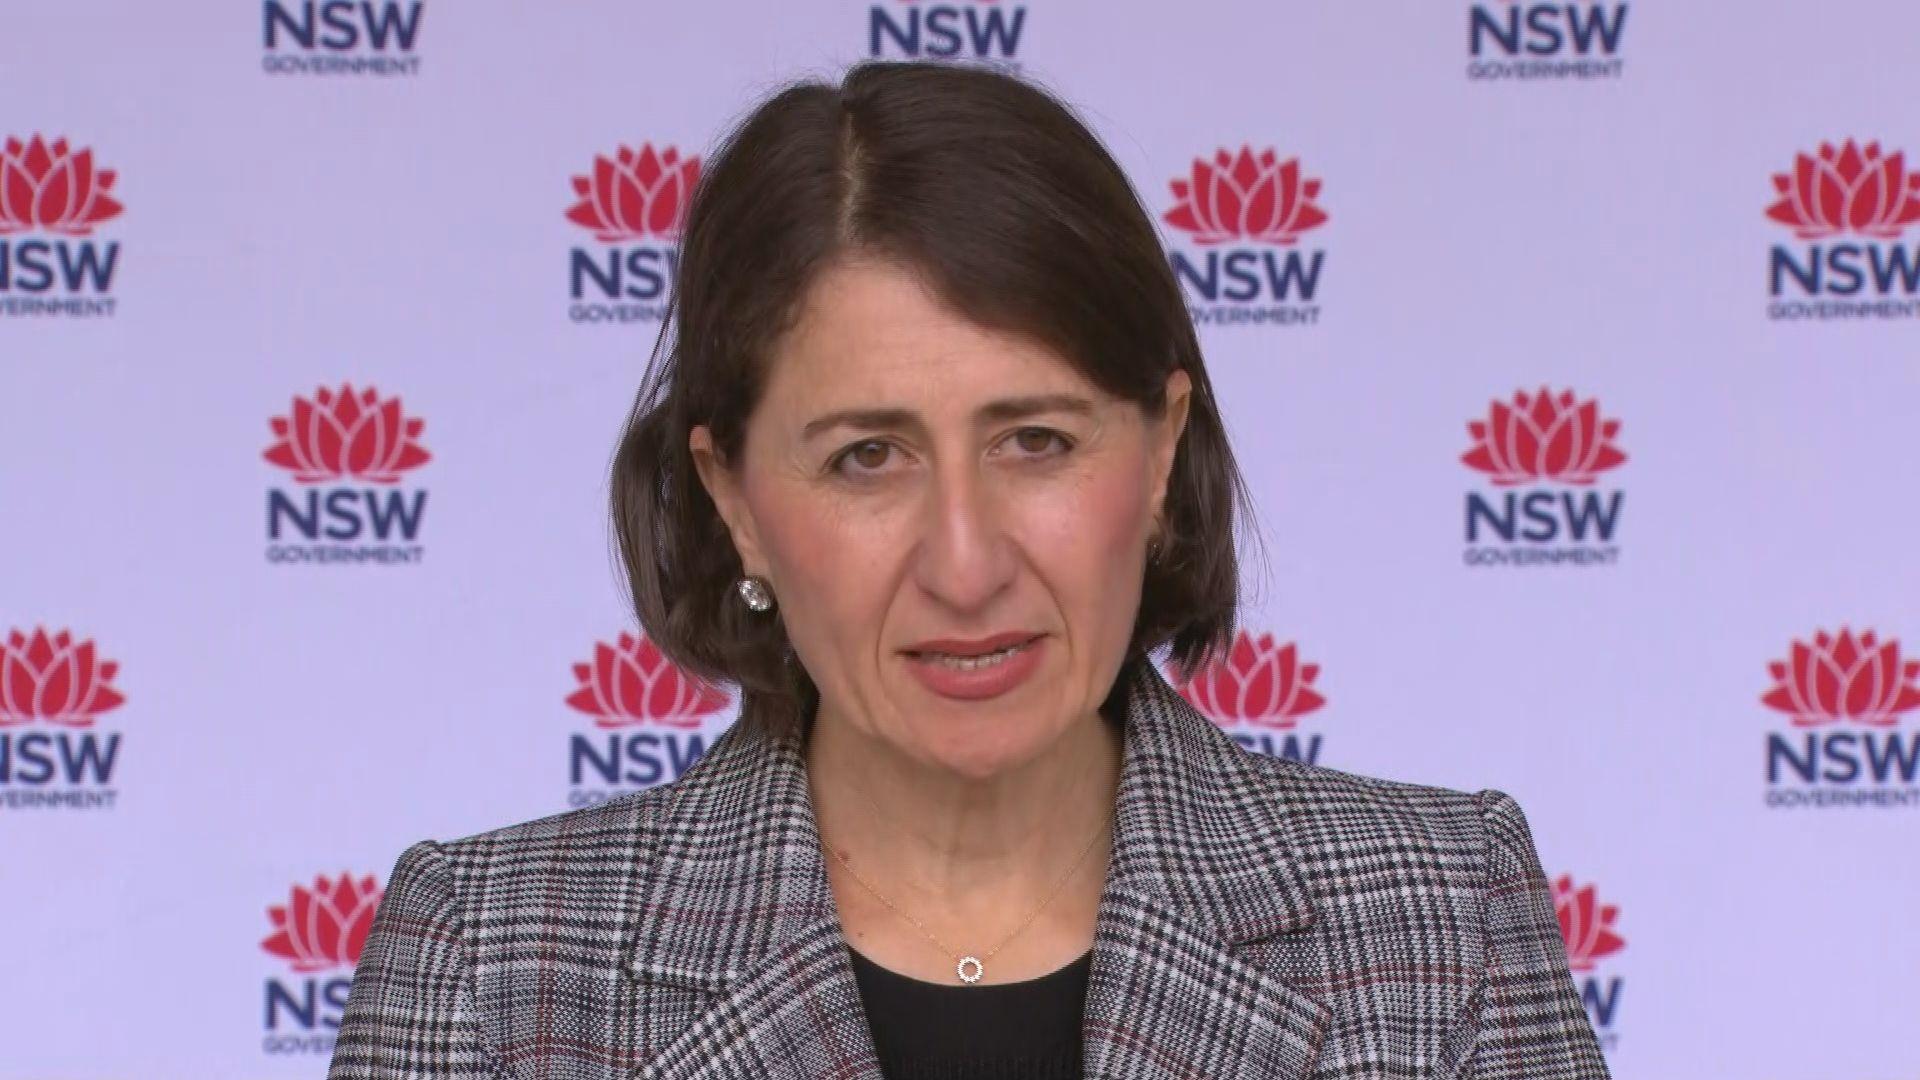 SCG Test can still host at a capacity of 50 per cent despite latest coronavirus restrictions, says NSW premier Gladys Berejiklian